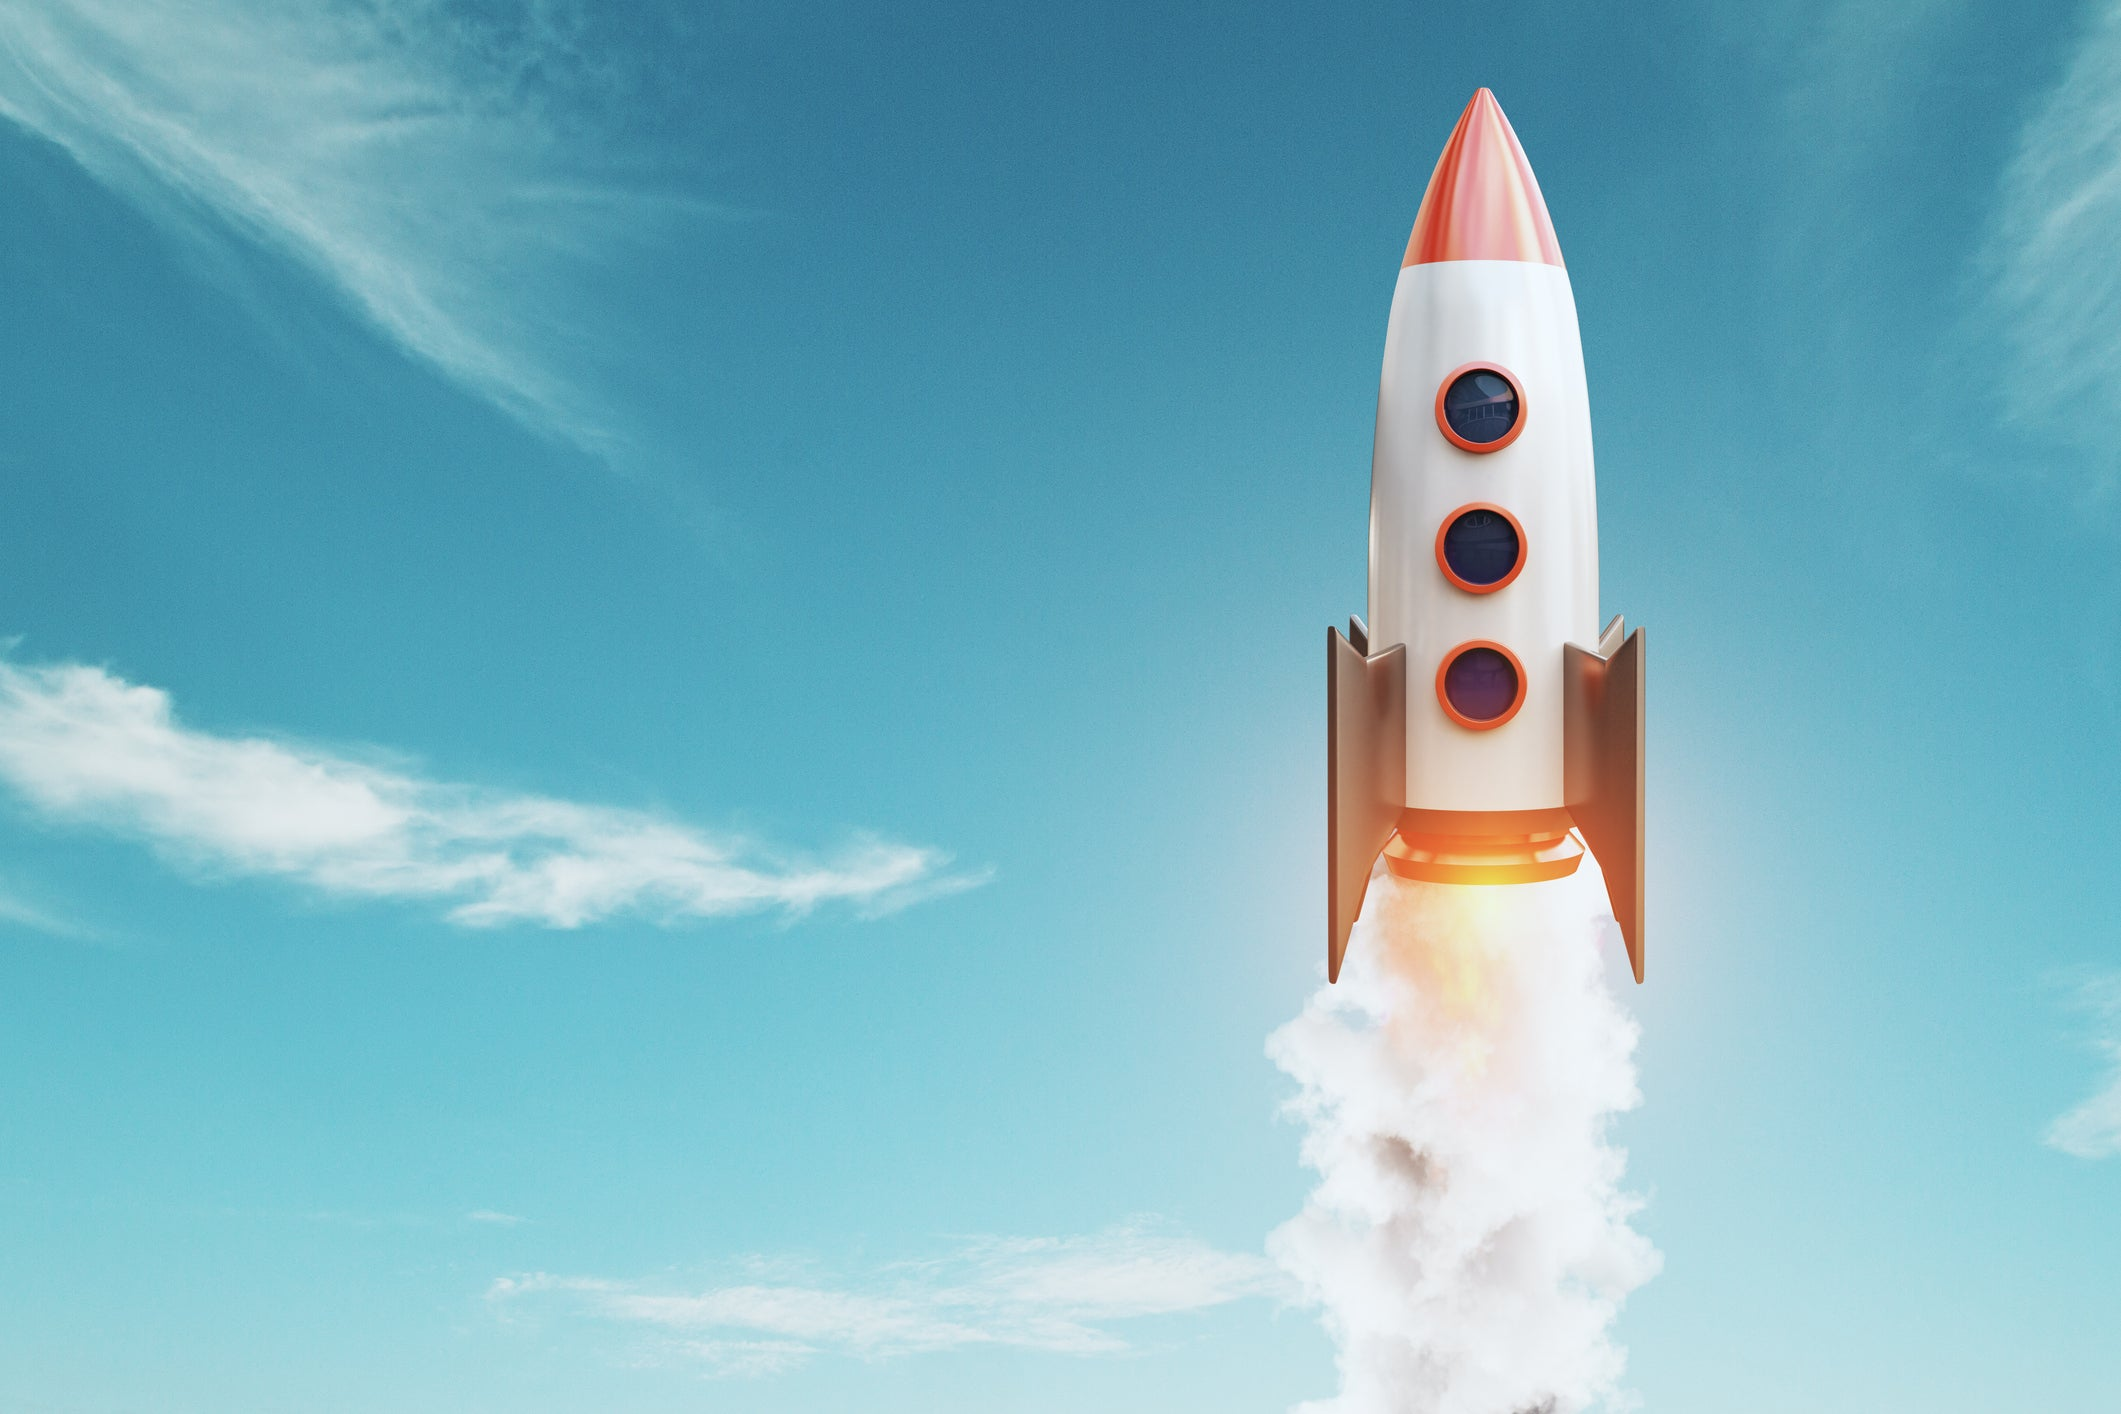 SpaceX Fails to Achieve Parachute Success During Test - Motley Fool